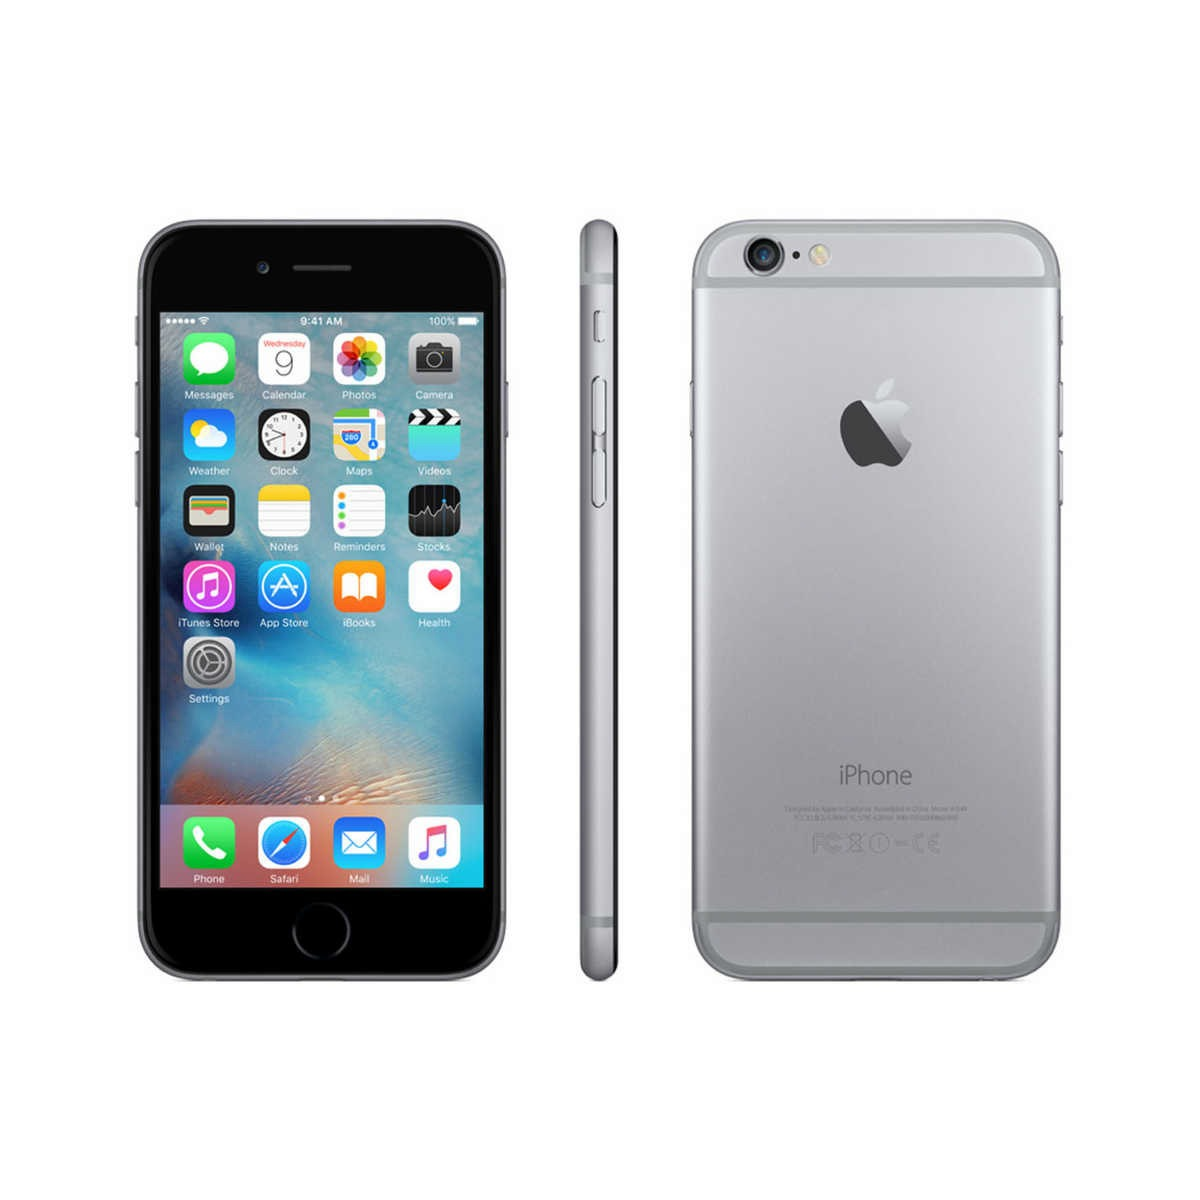 7c4b2f7f503 celular iphone 6 +funda protectora + protector para pantalla. Cargando zoom.